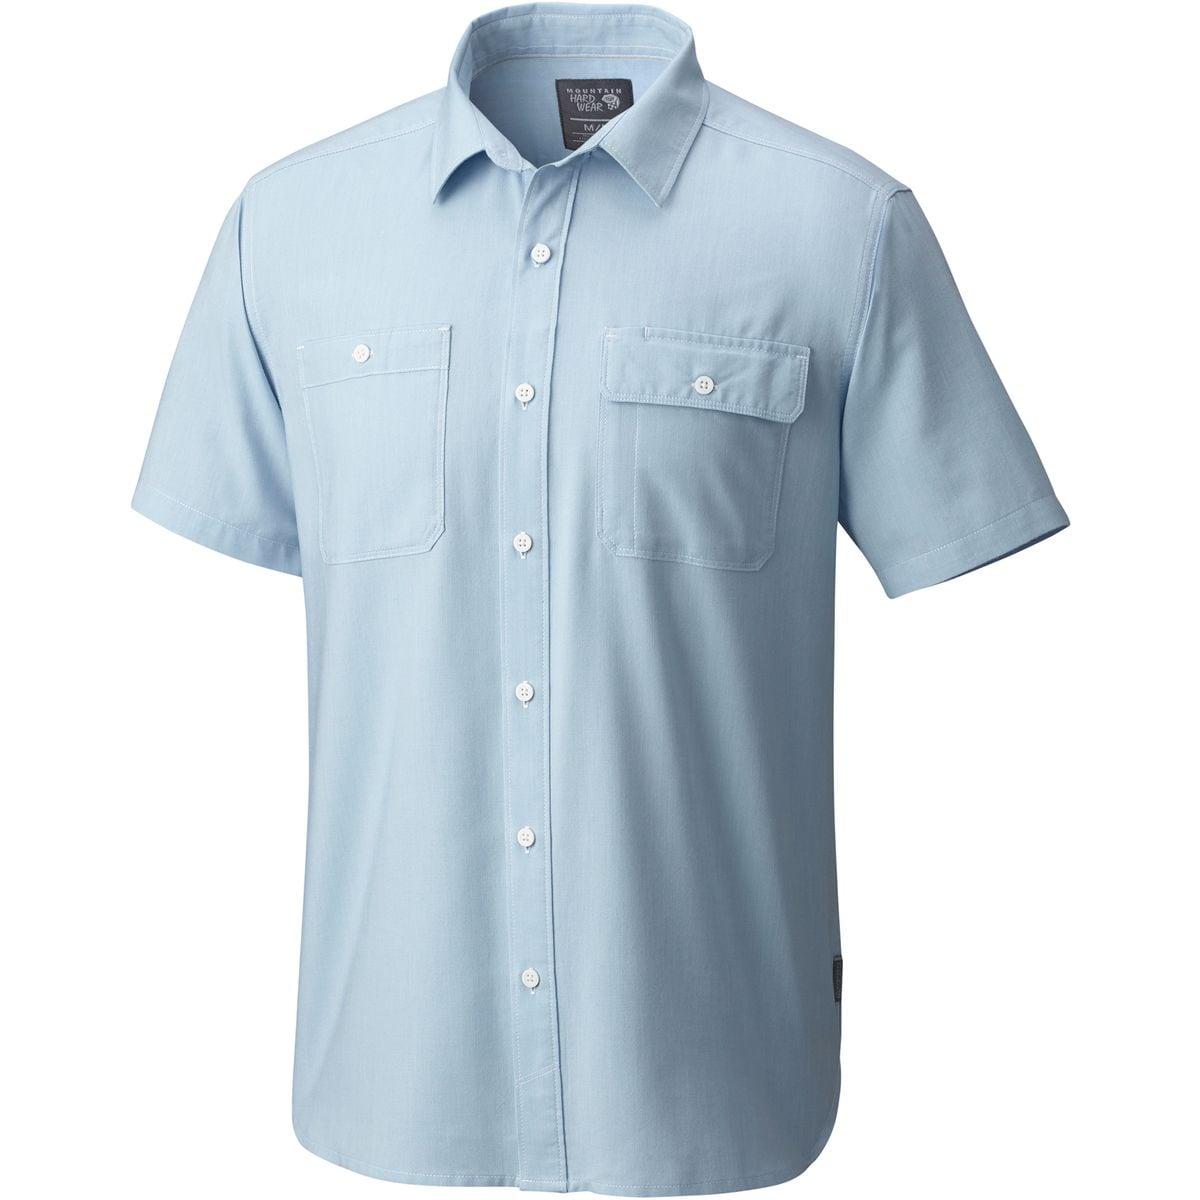 Mountain Hardwear Drummond Utility Shirt - Men